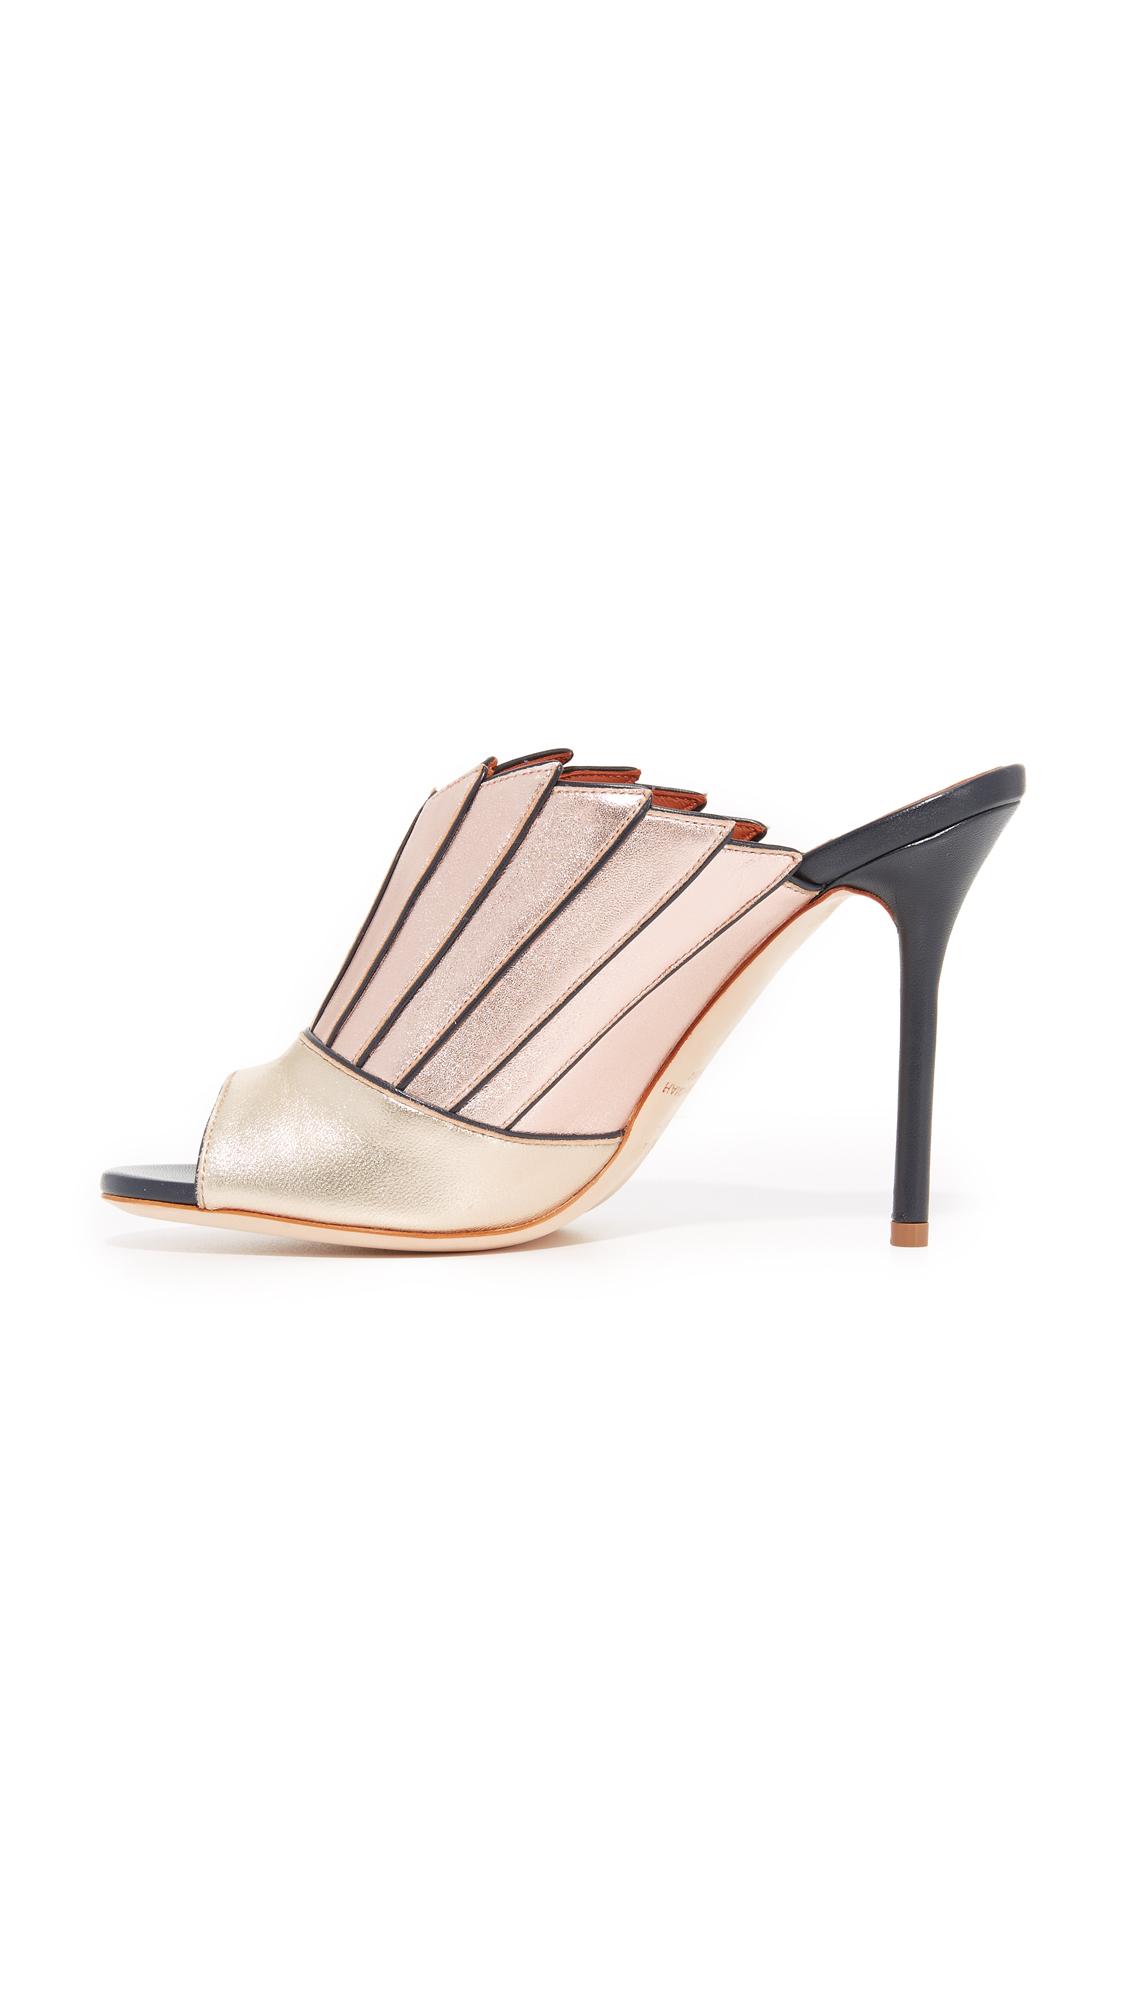 M&P Fashion - Peep-Toe donna , beige (Nude Beige), 35.5